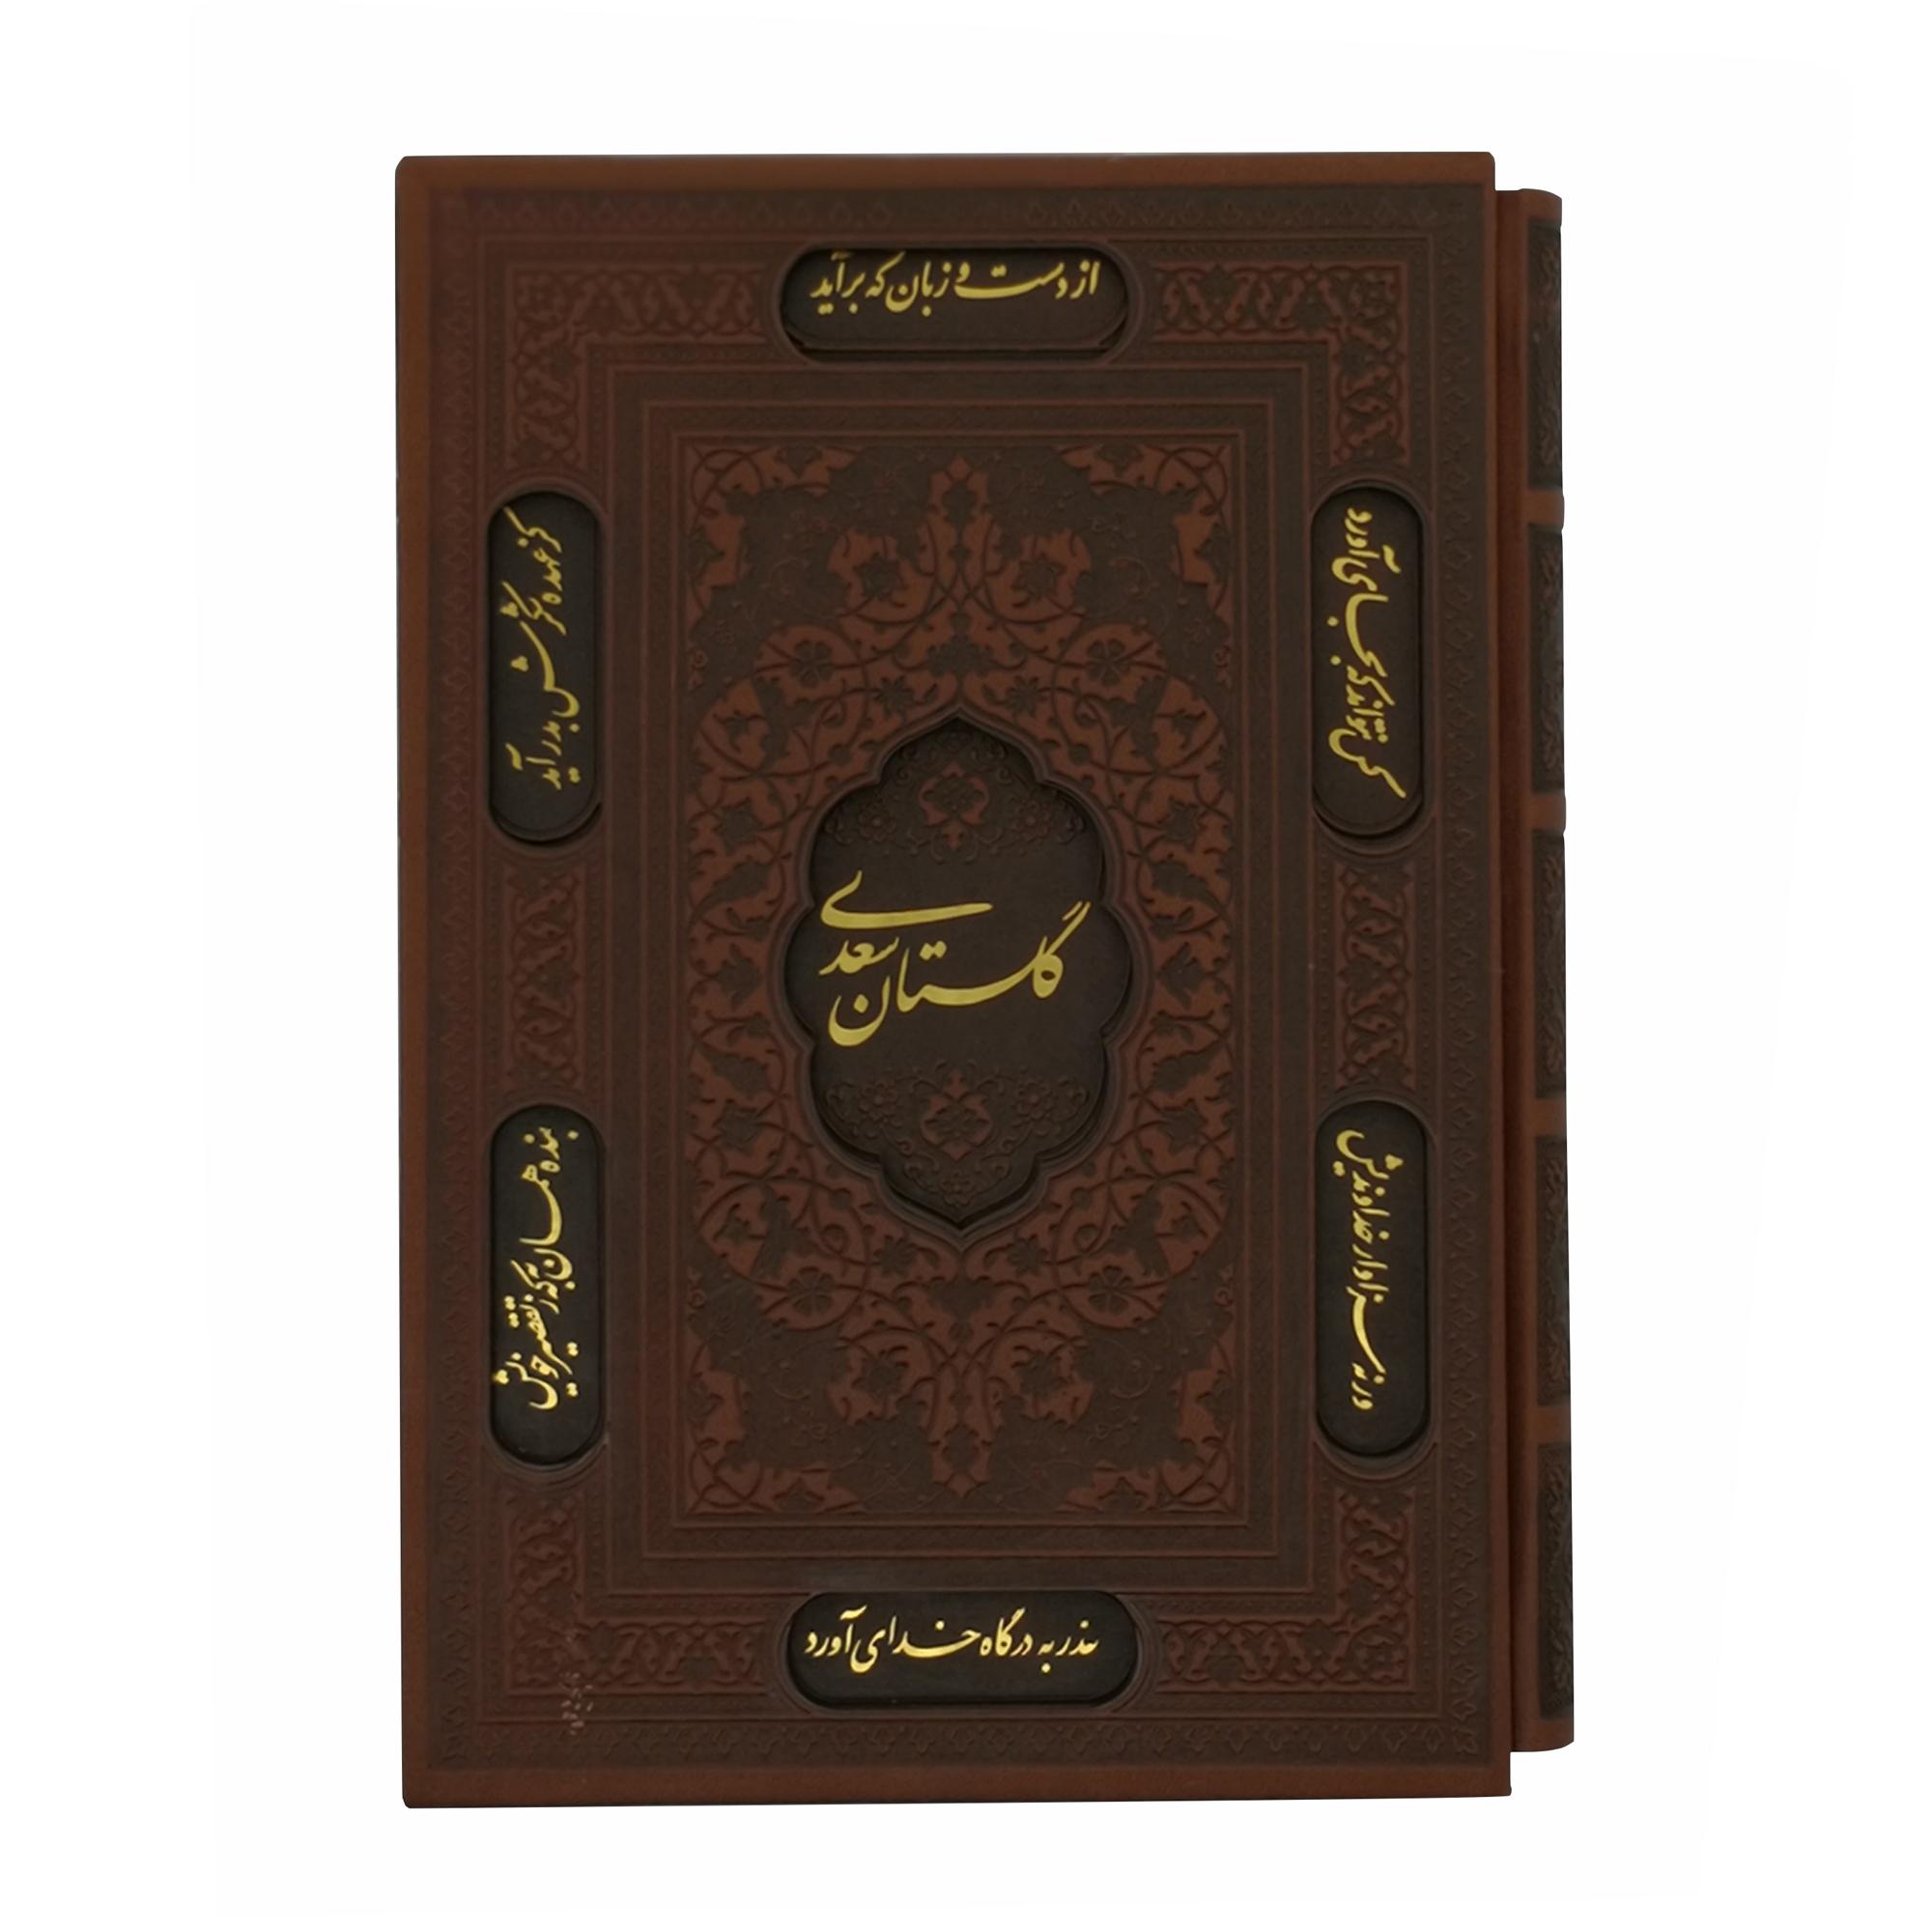 کتاب گلستان سعدی اثر سعدی شیرازی انتشارات پیام عدالت